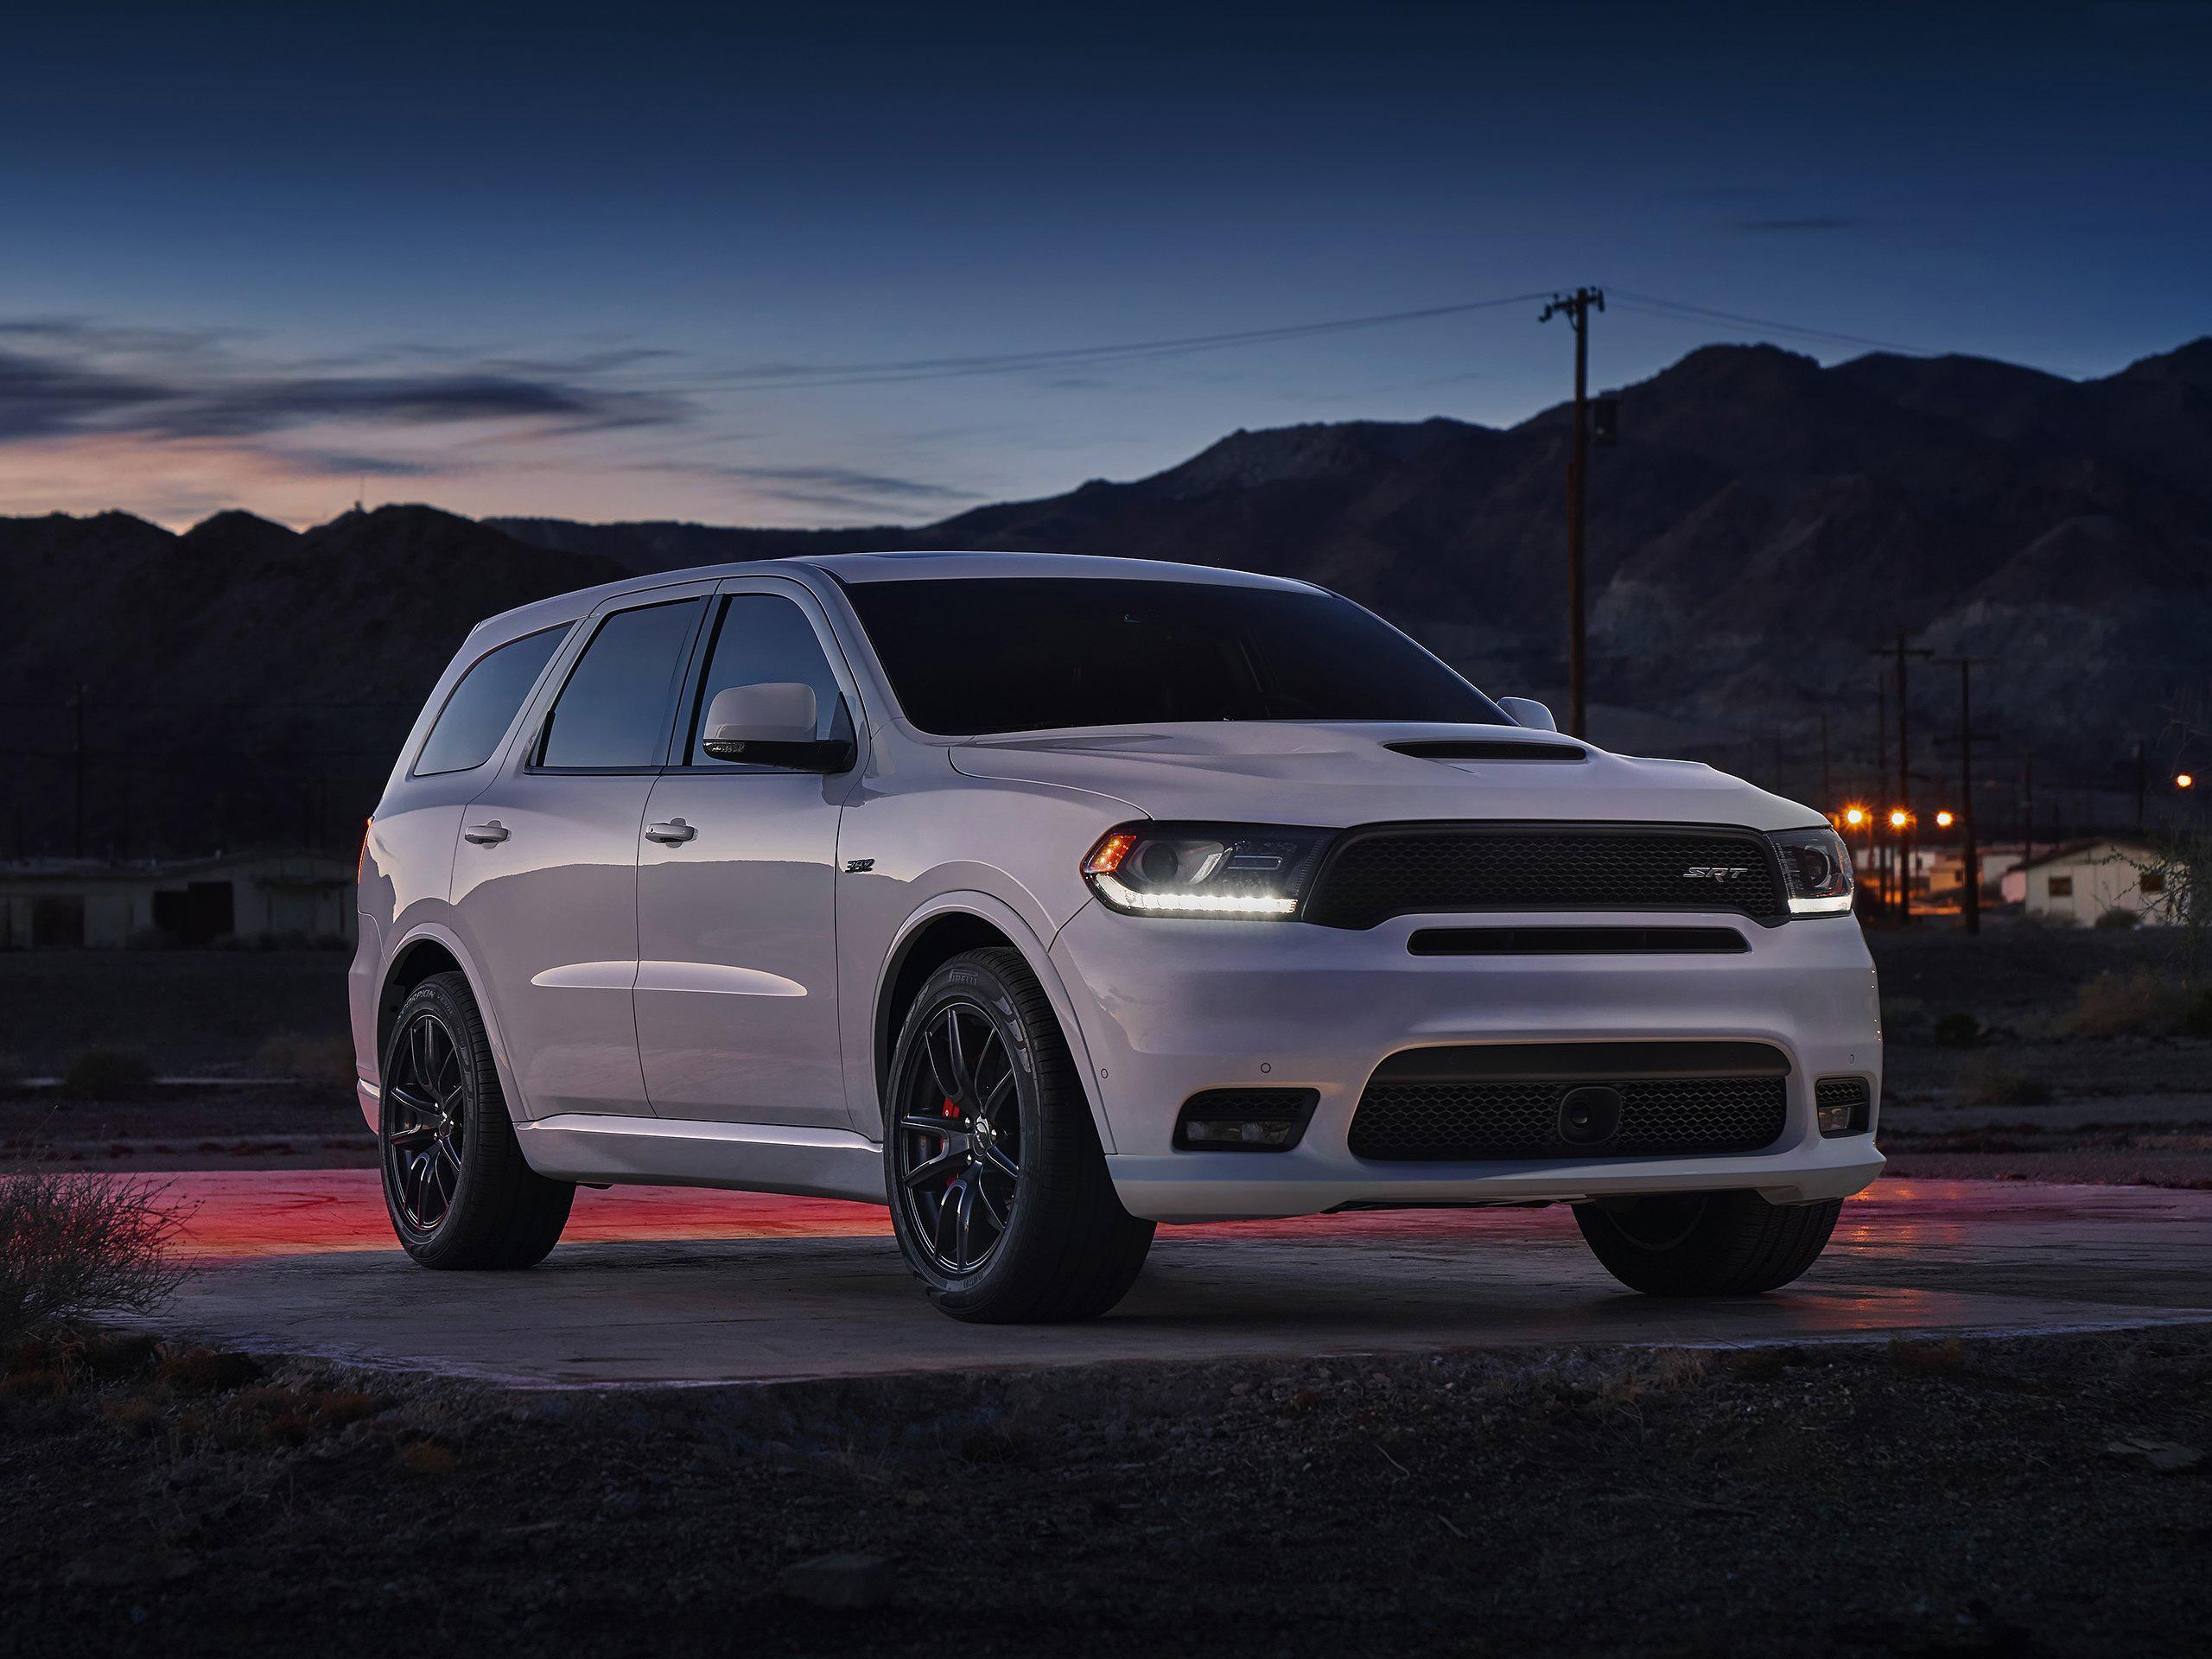 Dodge durango srt 2018 hd cars 4k wallpapers images - Dodge car 4k wallpaper ...